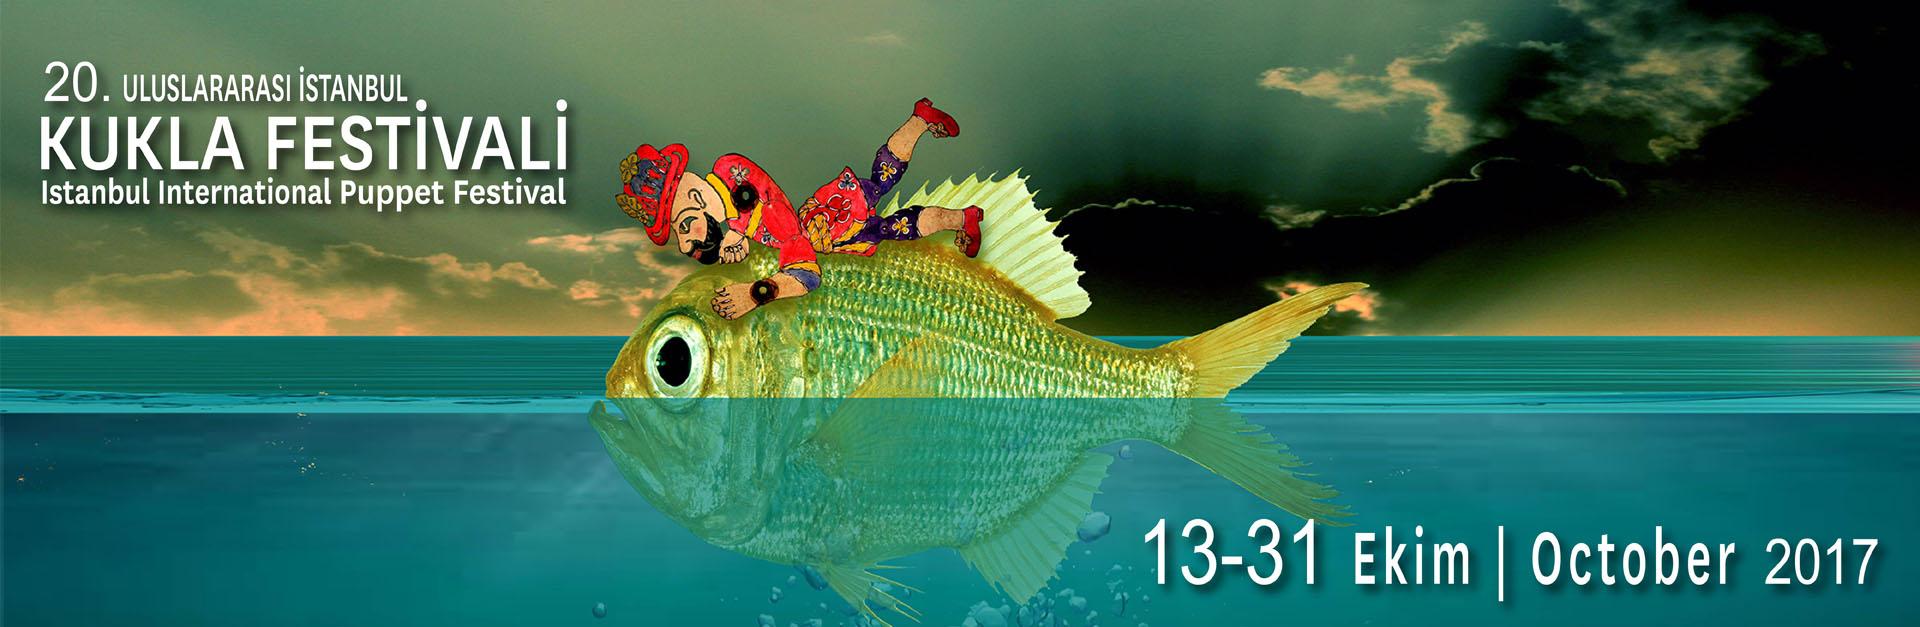 20-istanbul-kukla-festivali